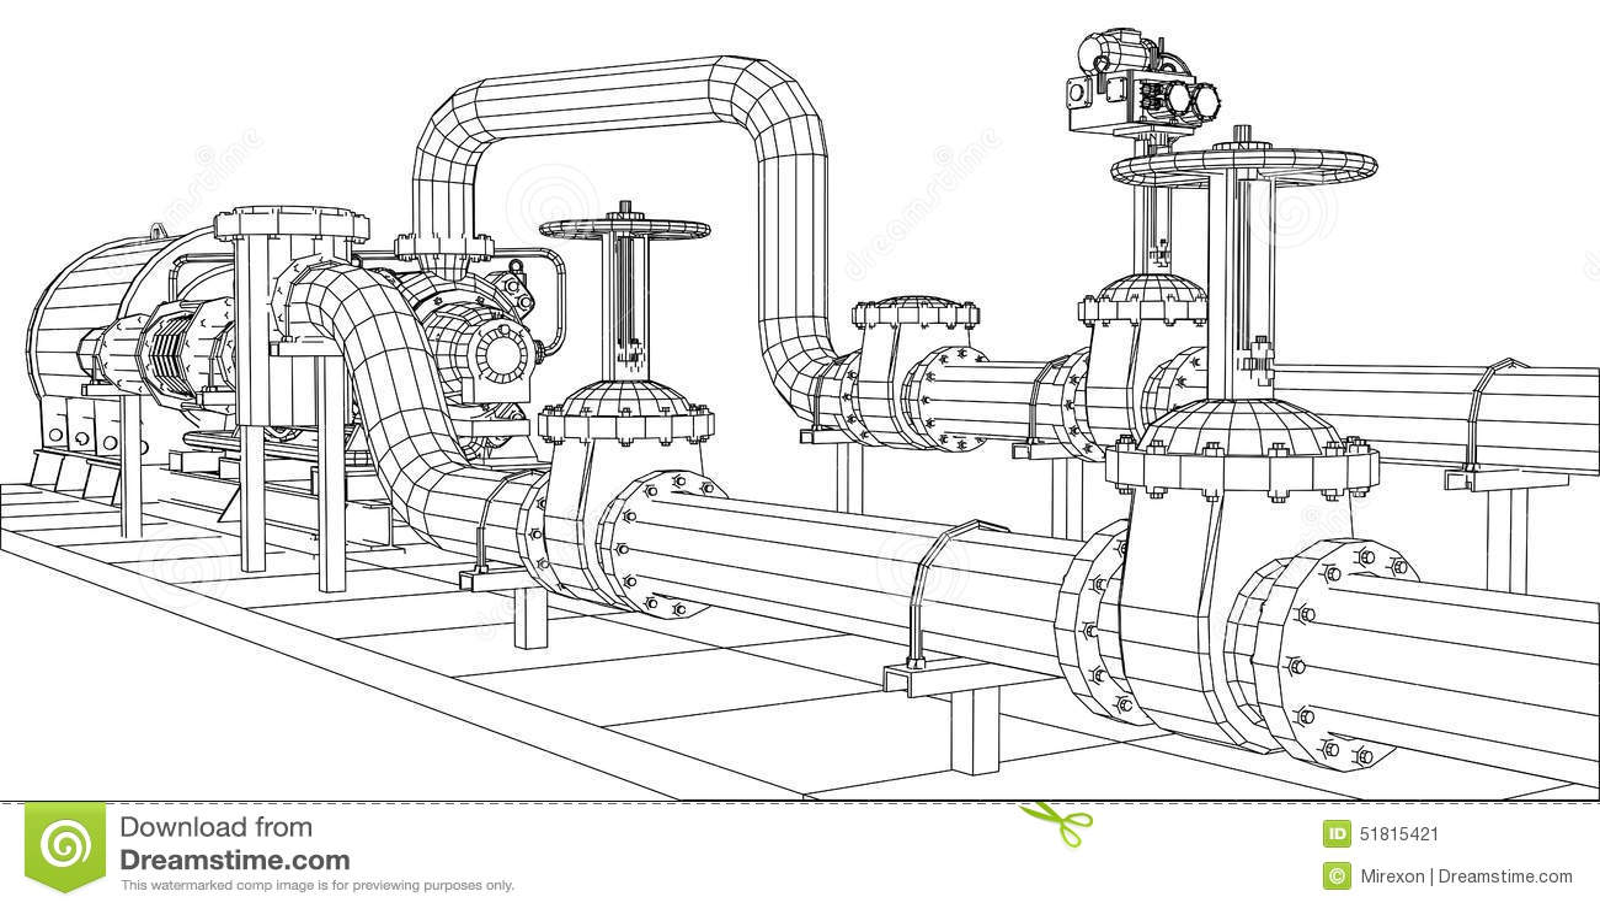 Bomba de petróleo e gás do equipamento industrial do Fio-quadro